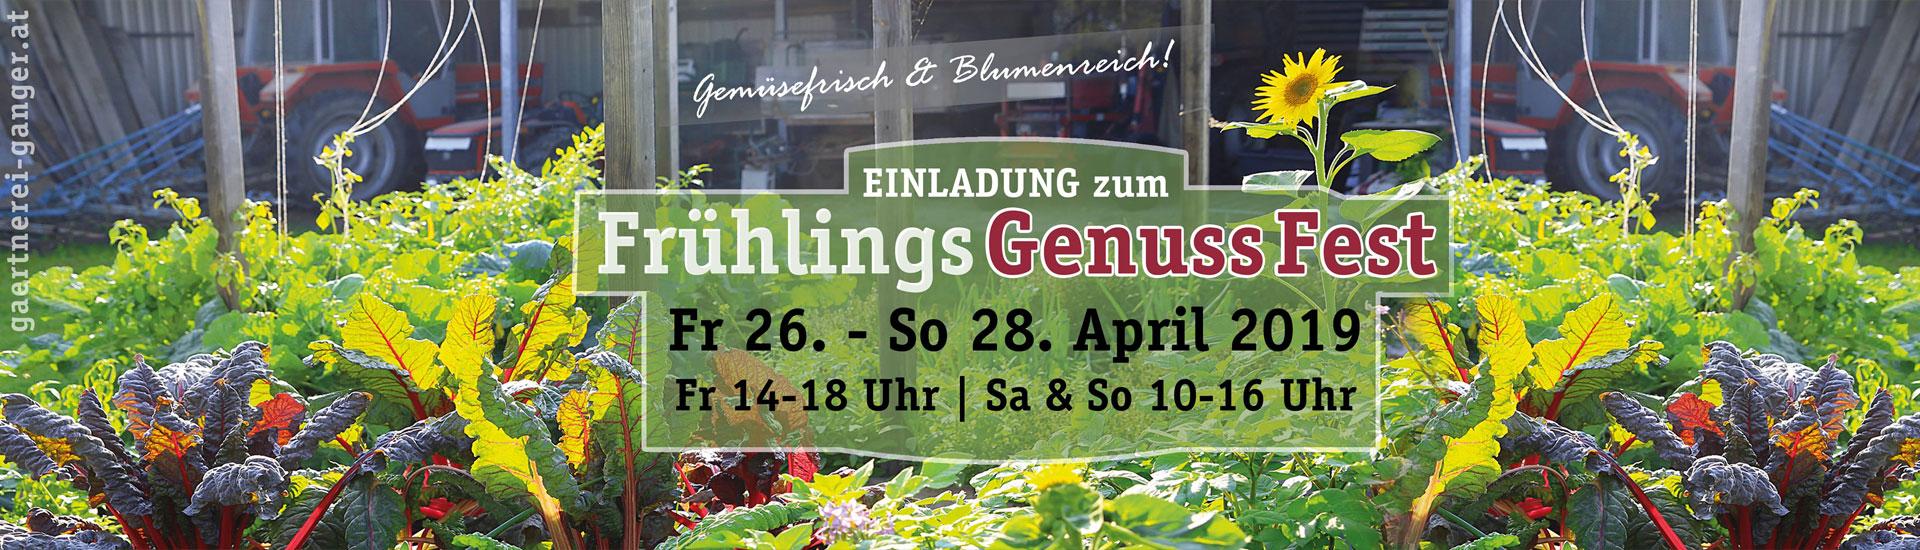 Gärtnerei Ganger | FrühlingsGenussFest 2019